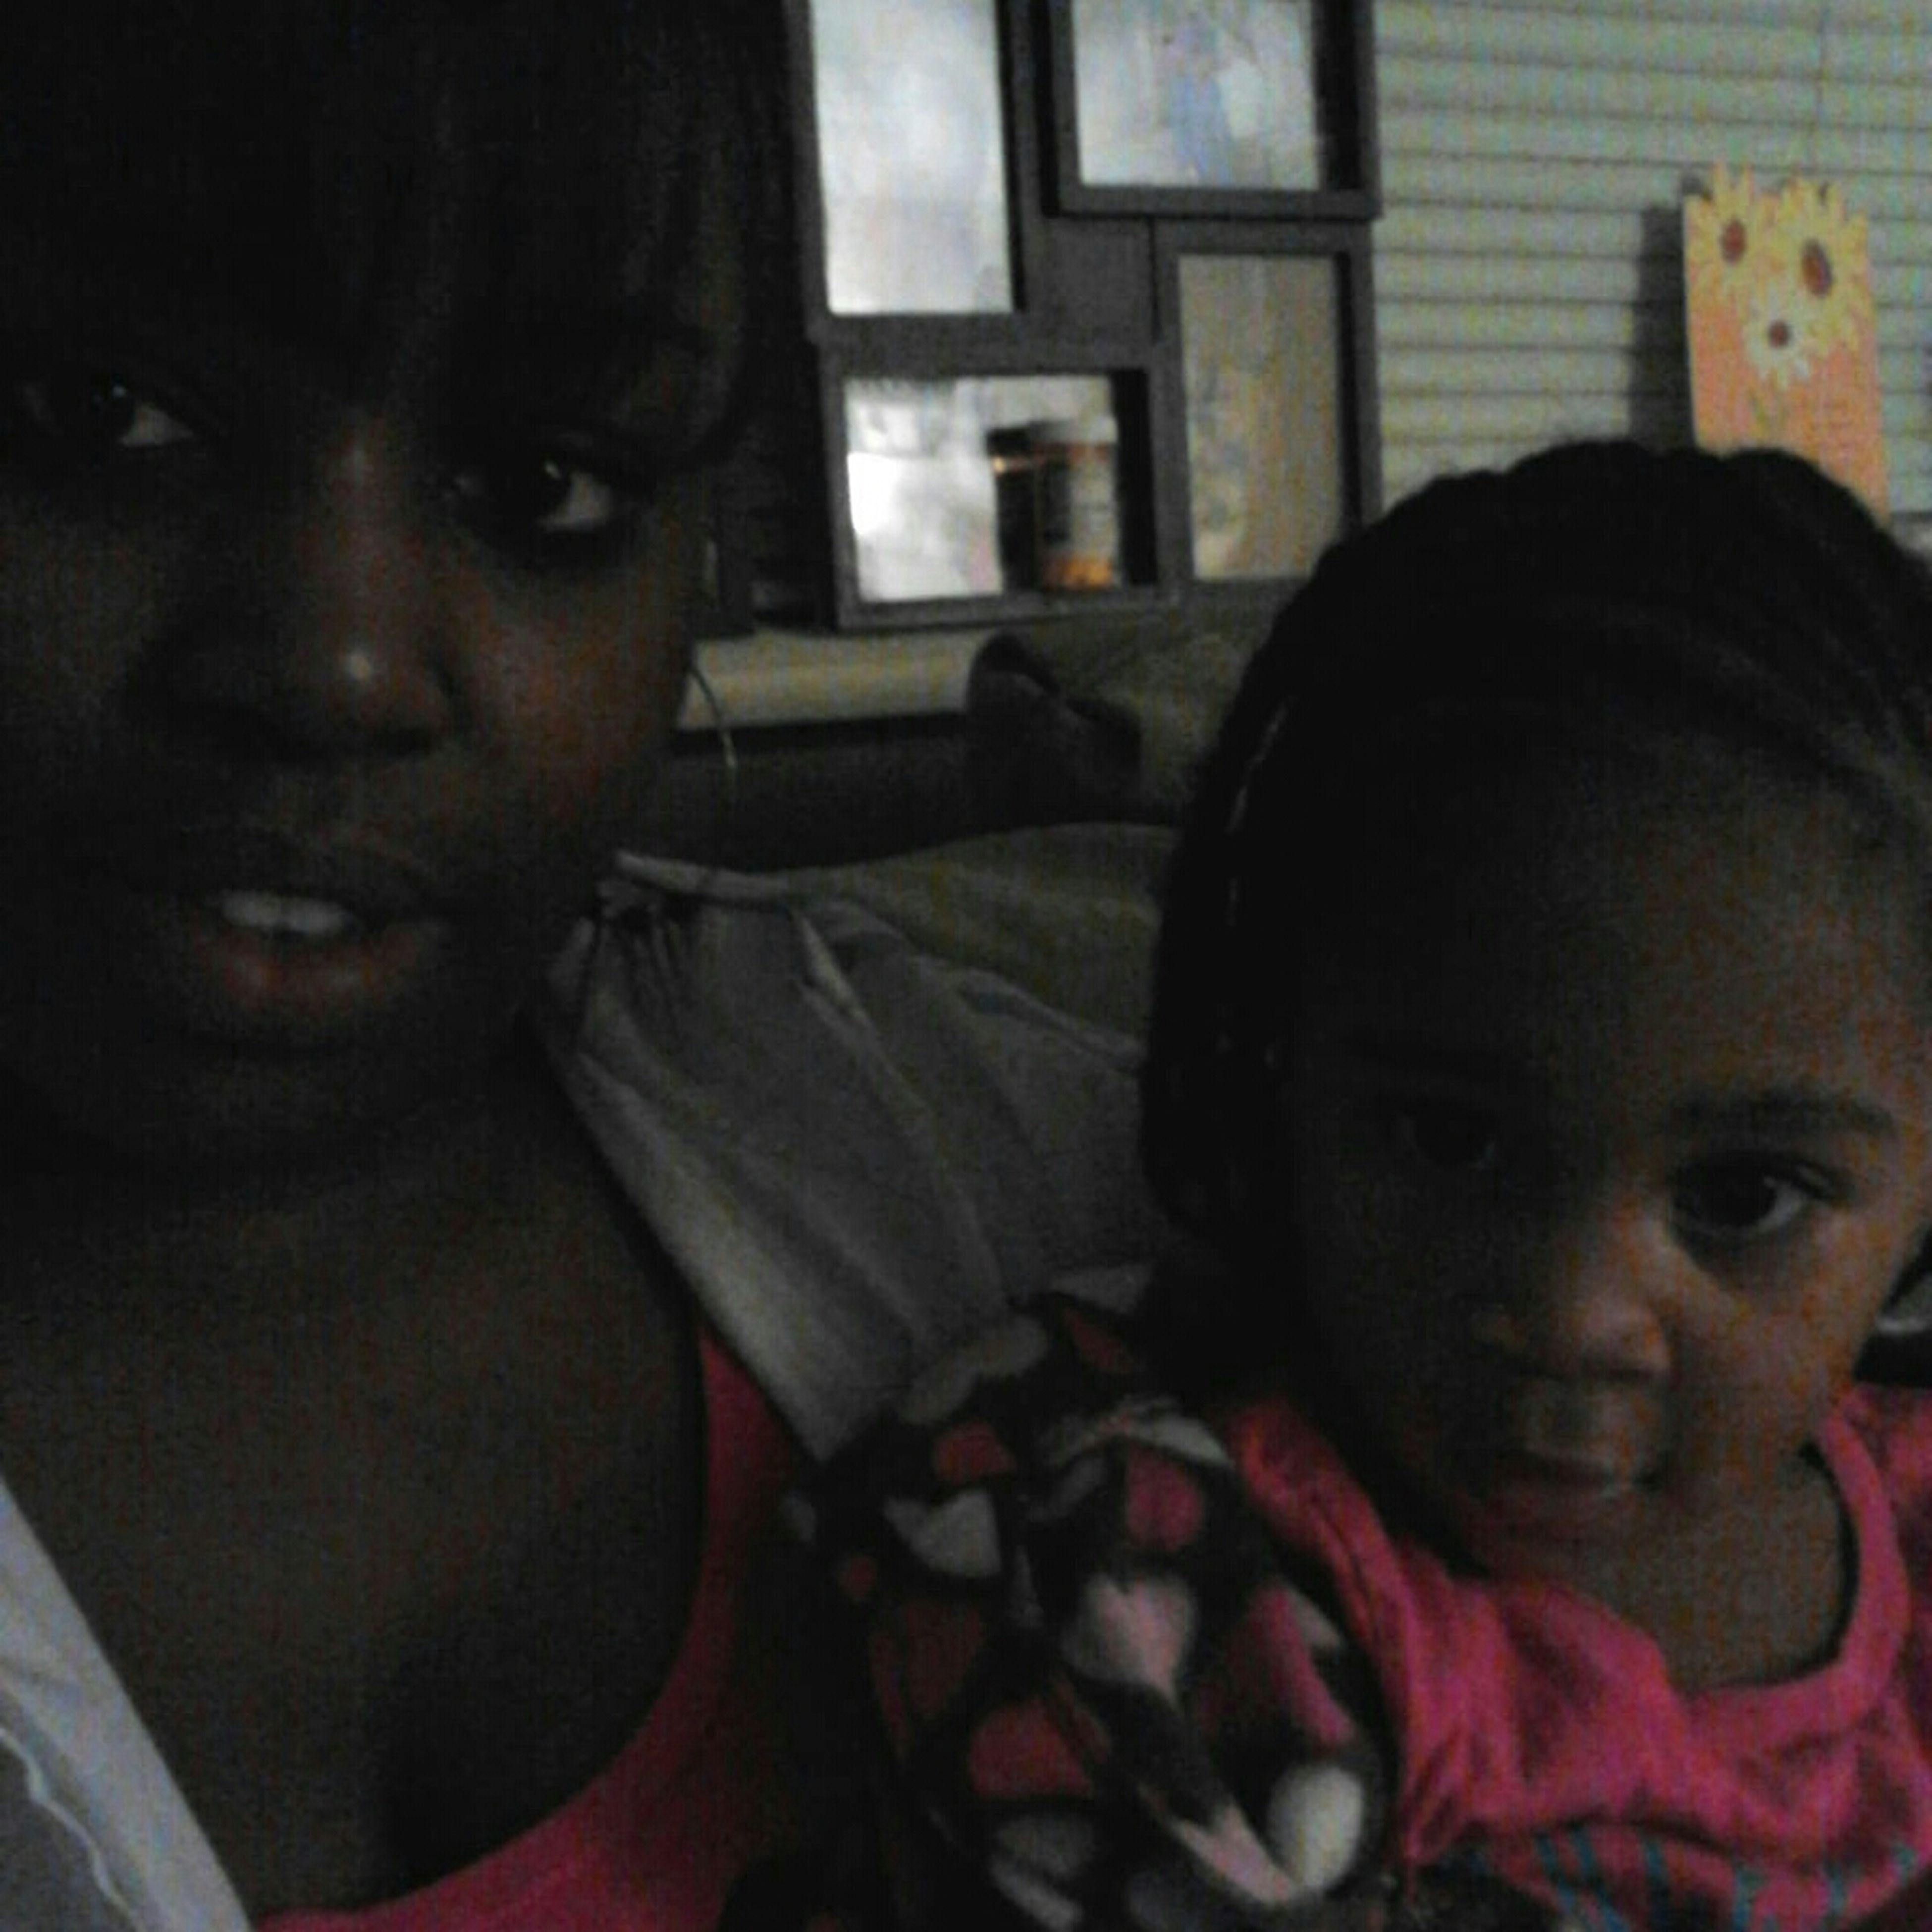 Me And Jurnee